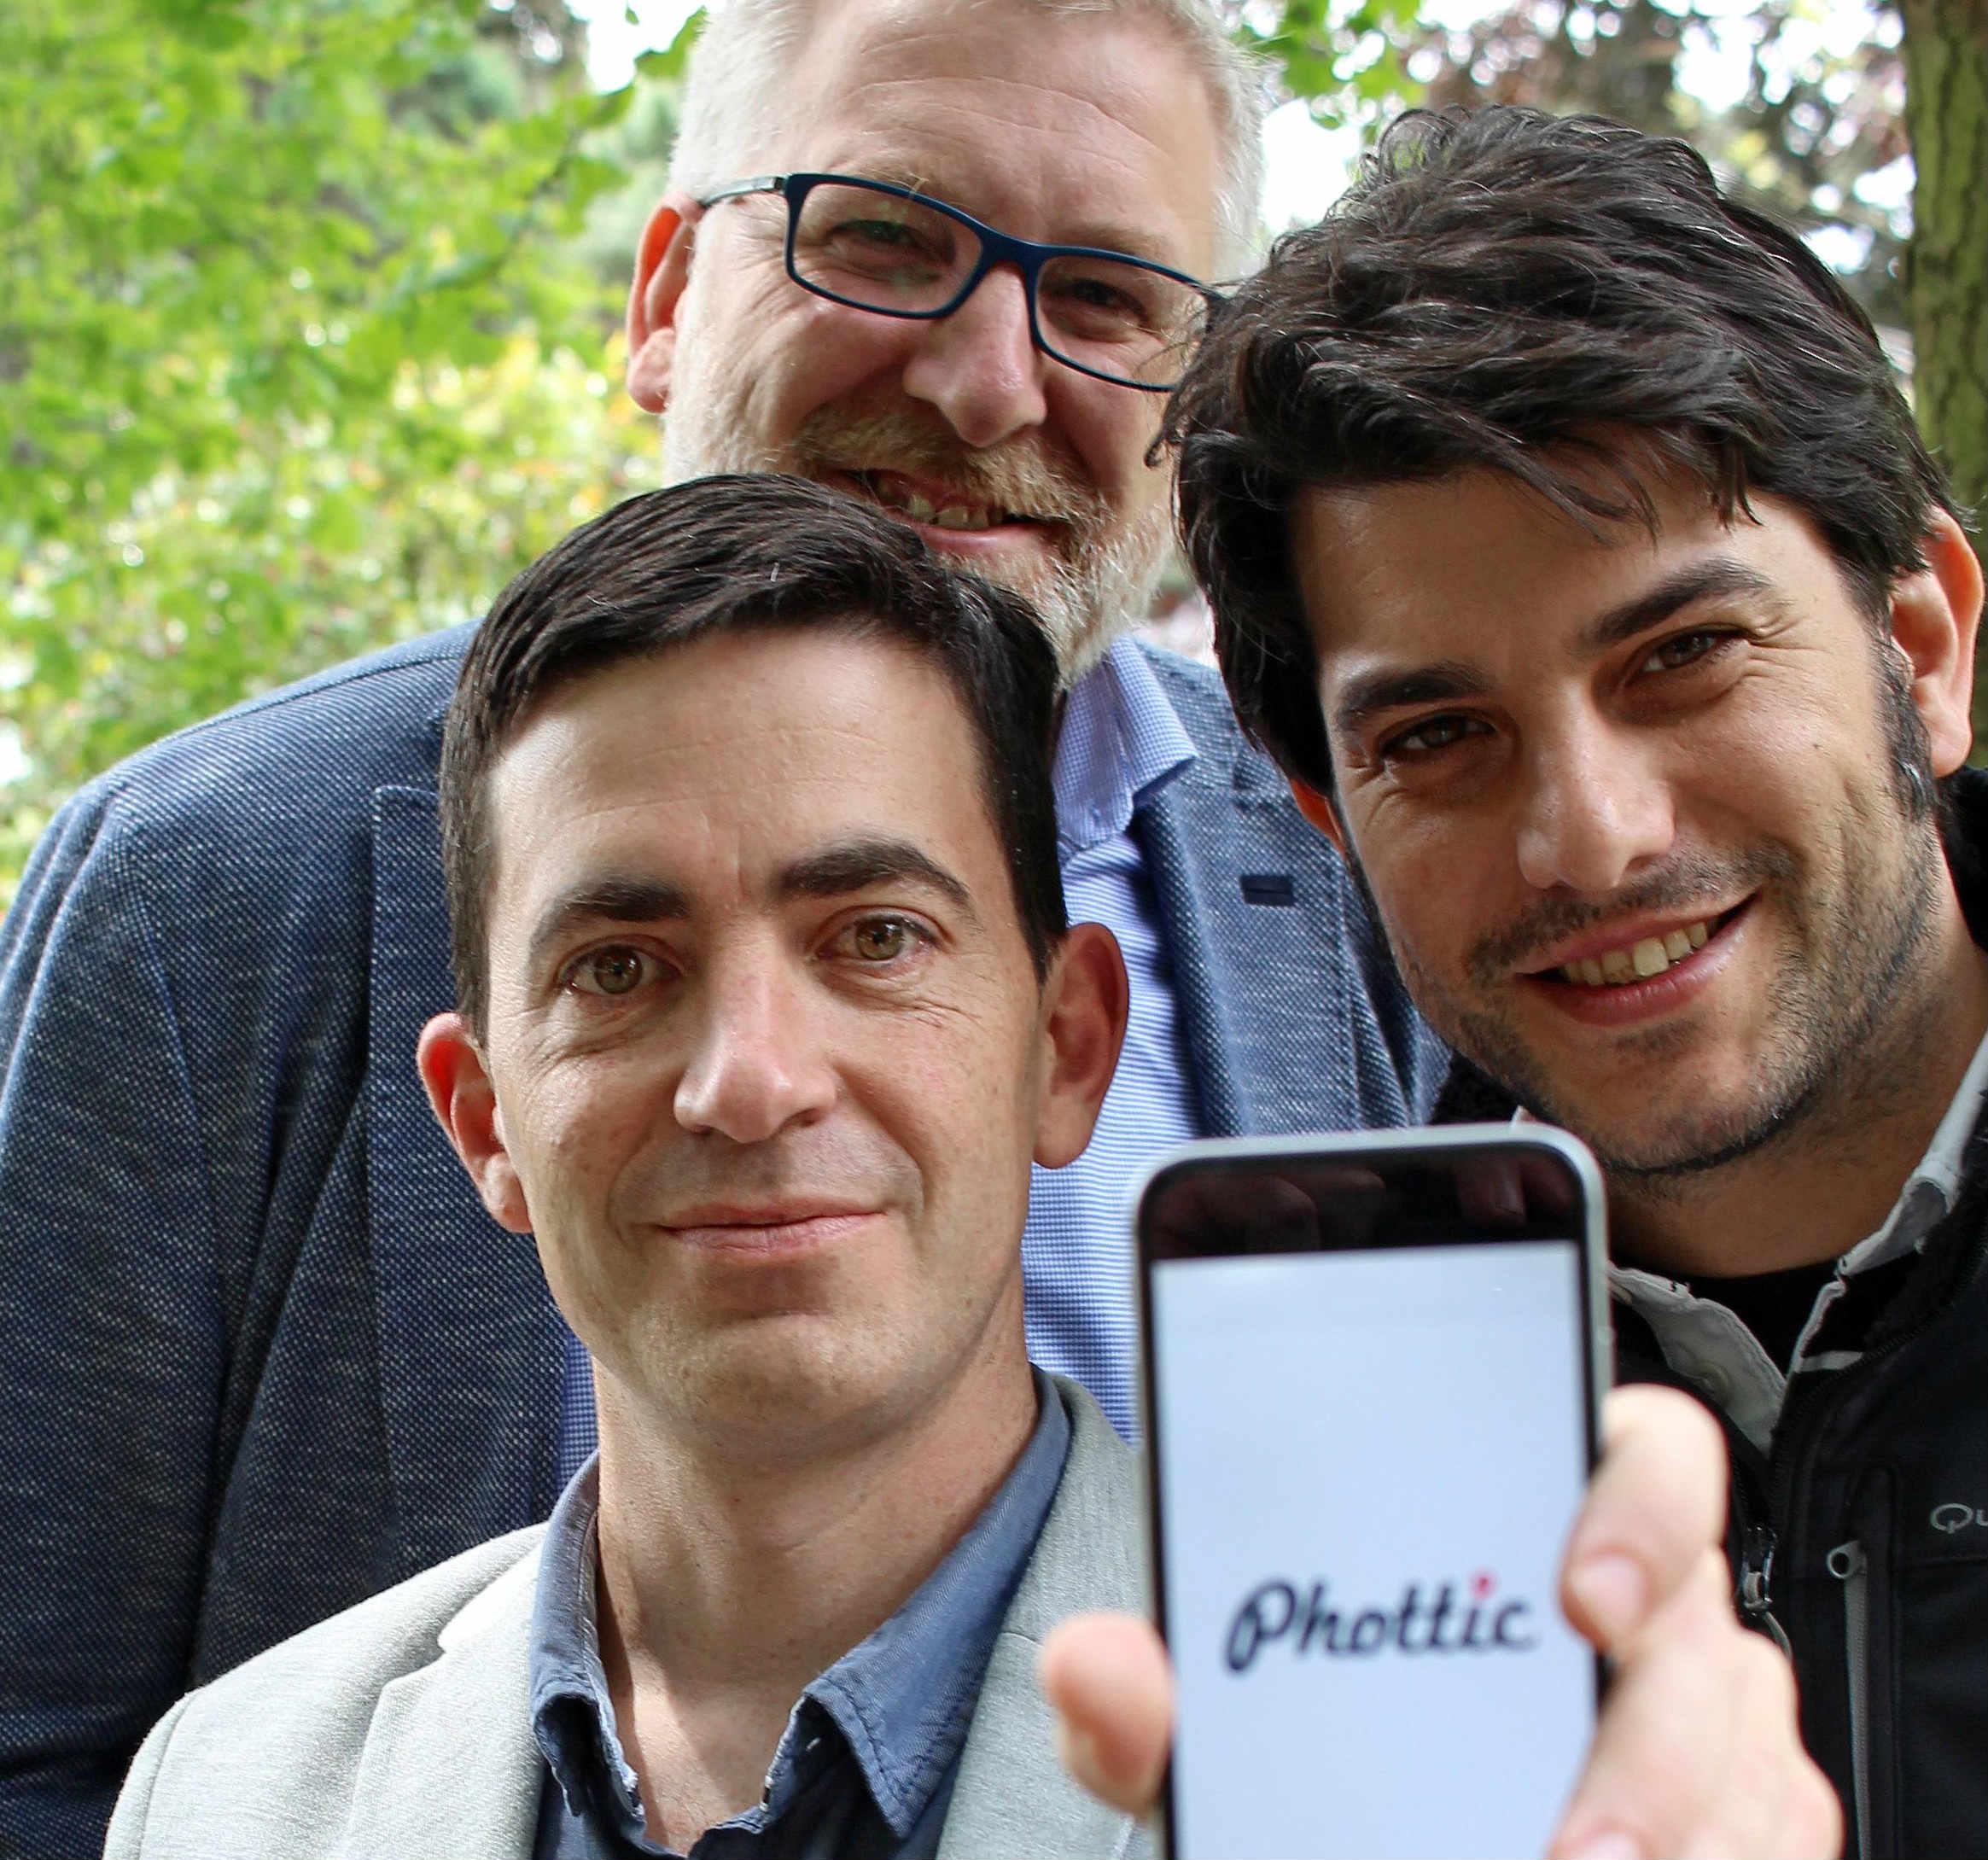 Alejandro Lamas, Manuel Pan e Daniel Cerqueiro, impulsores de Phottic.